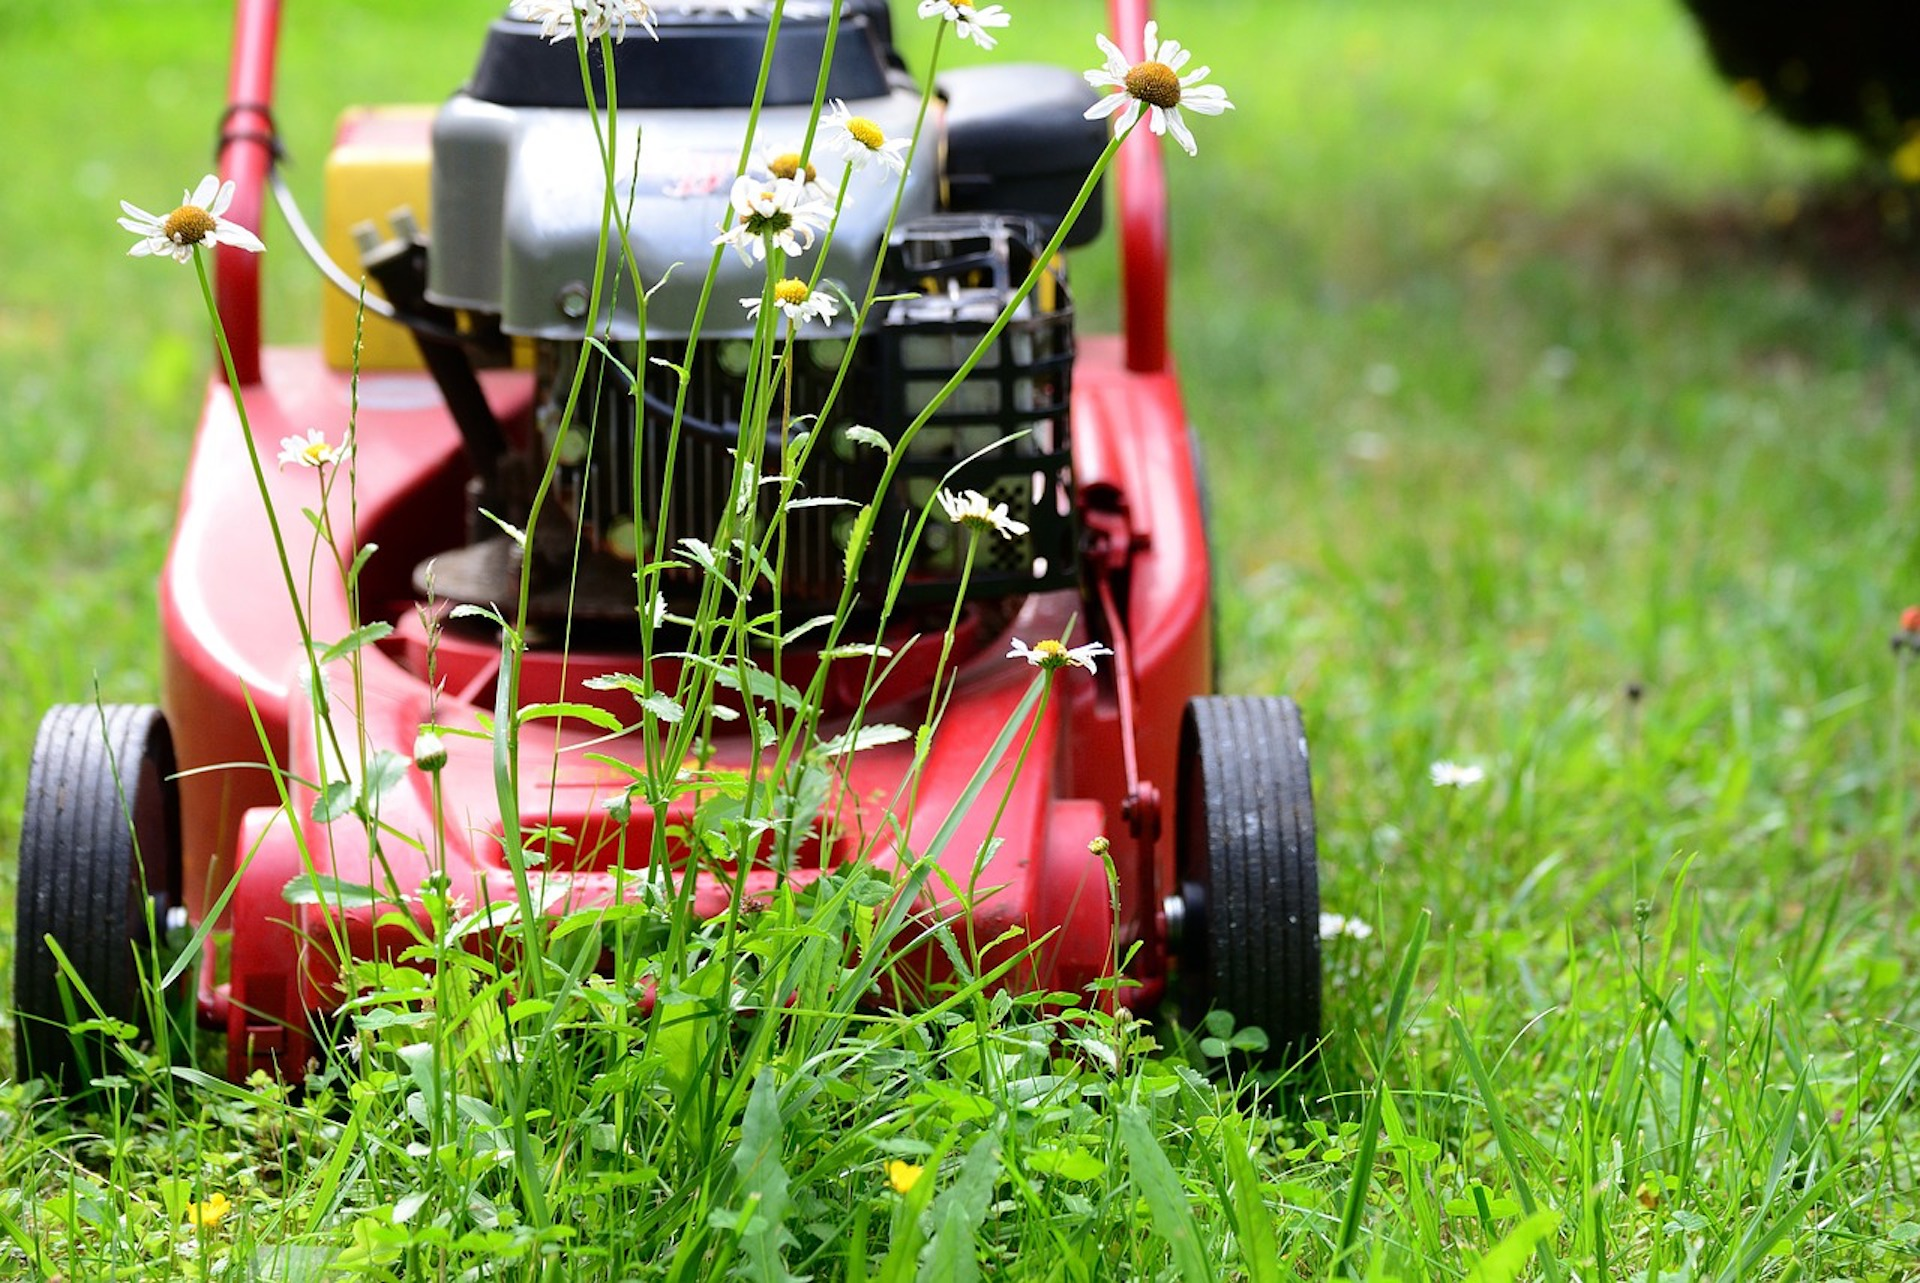 lawn-mower-5329533_1280